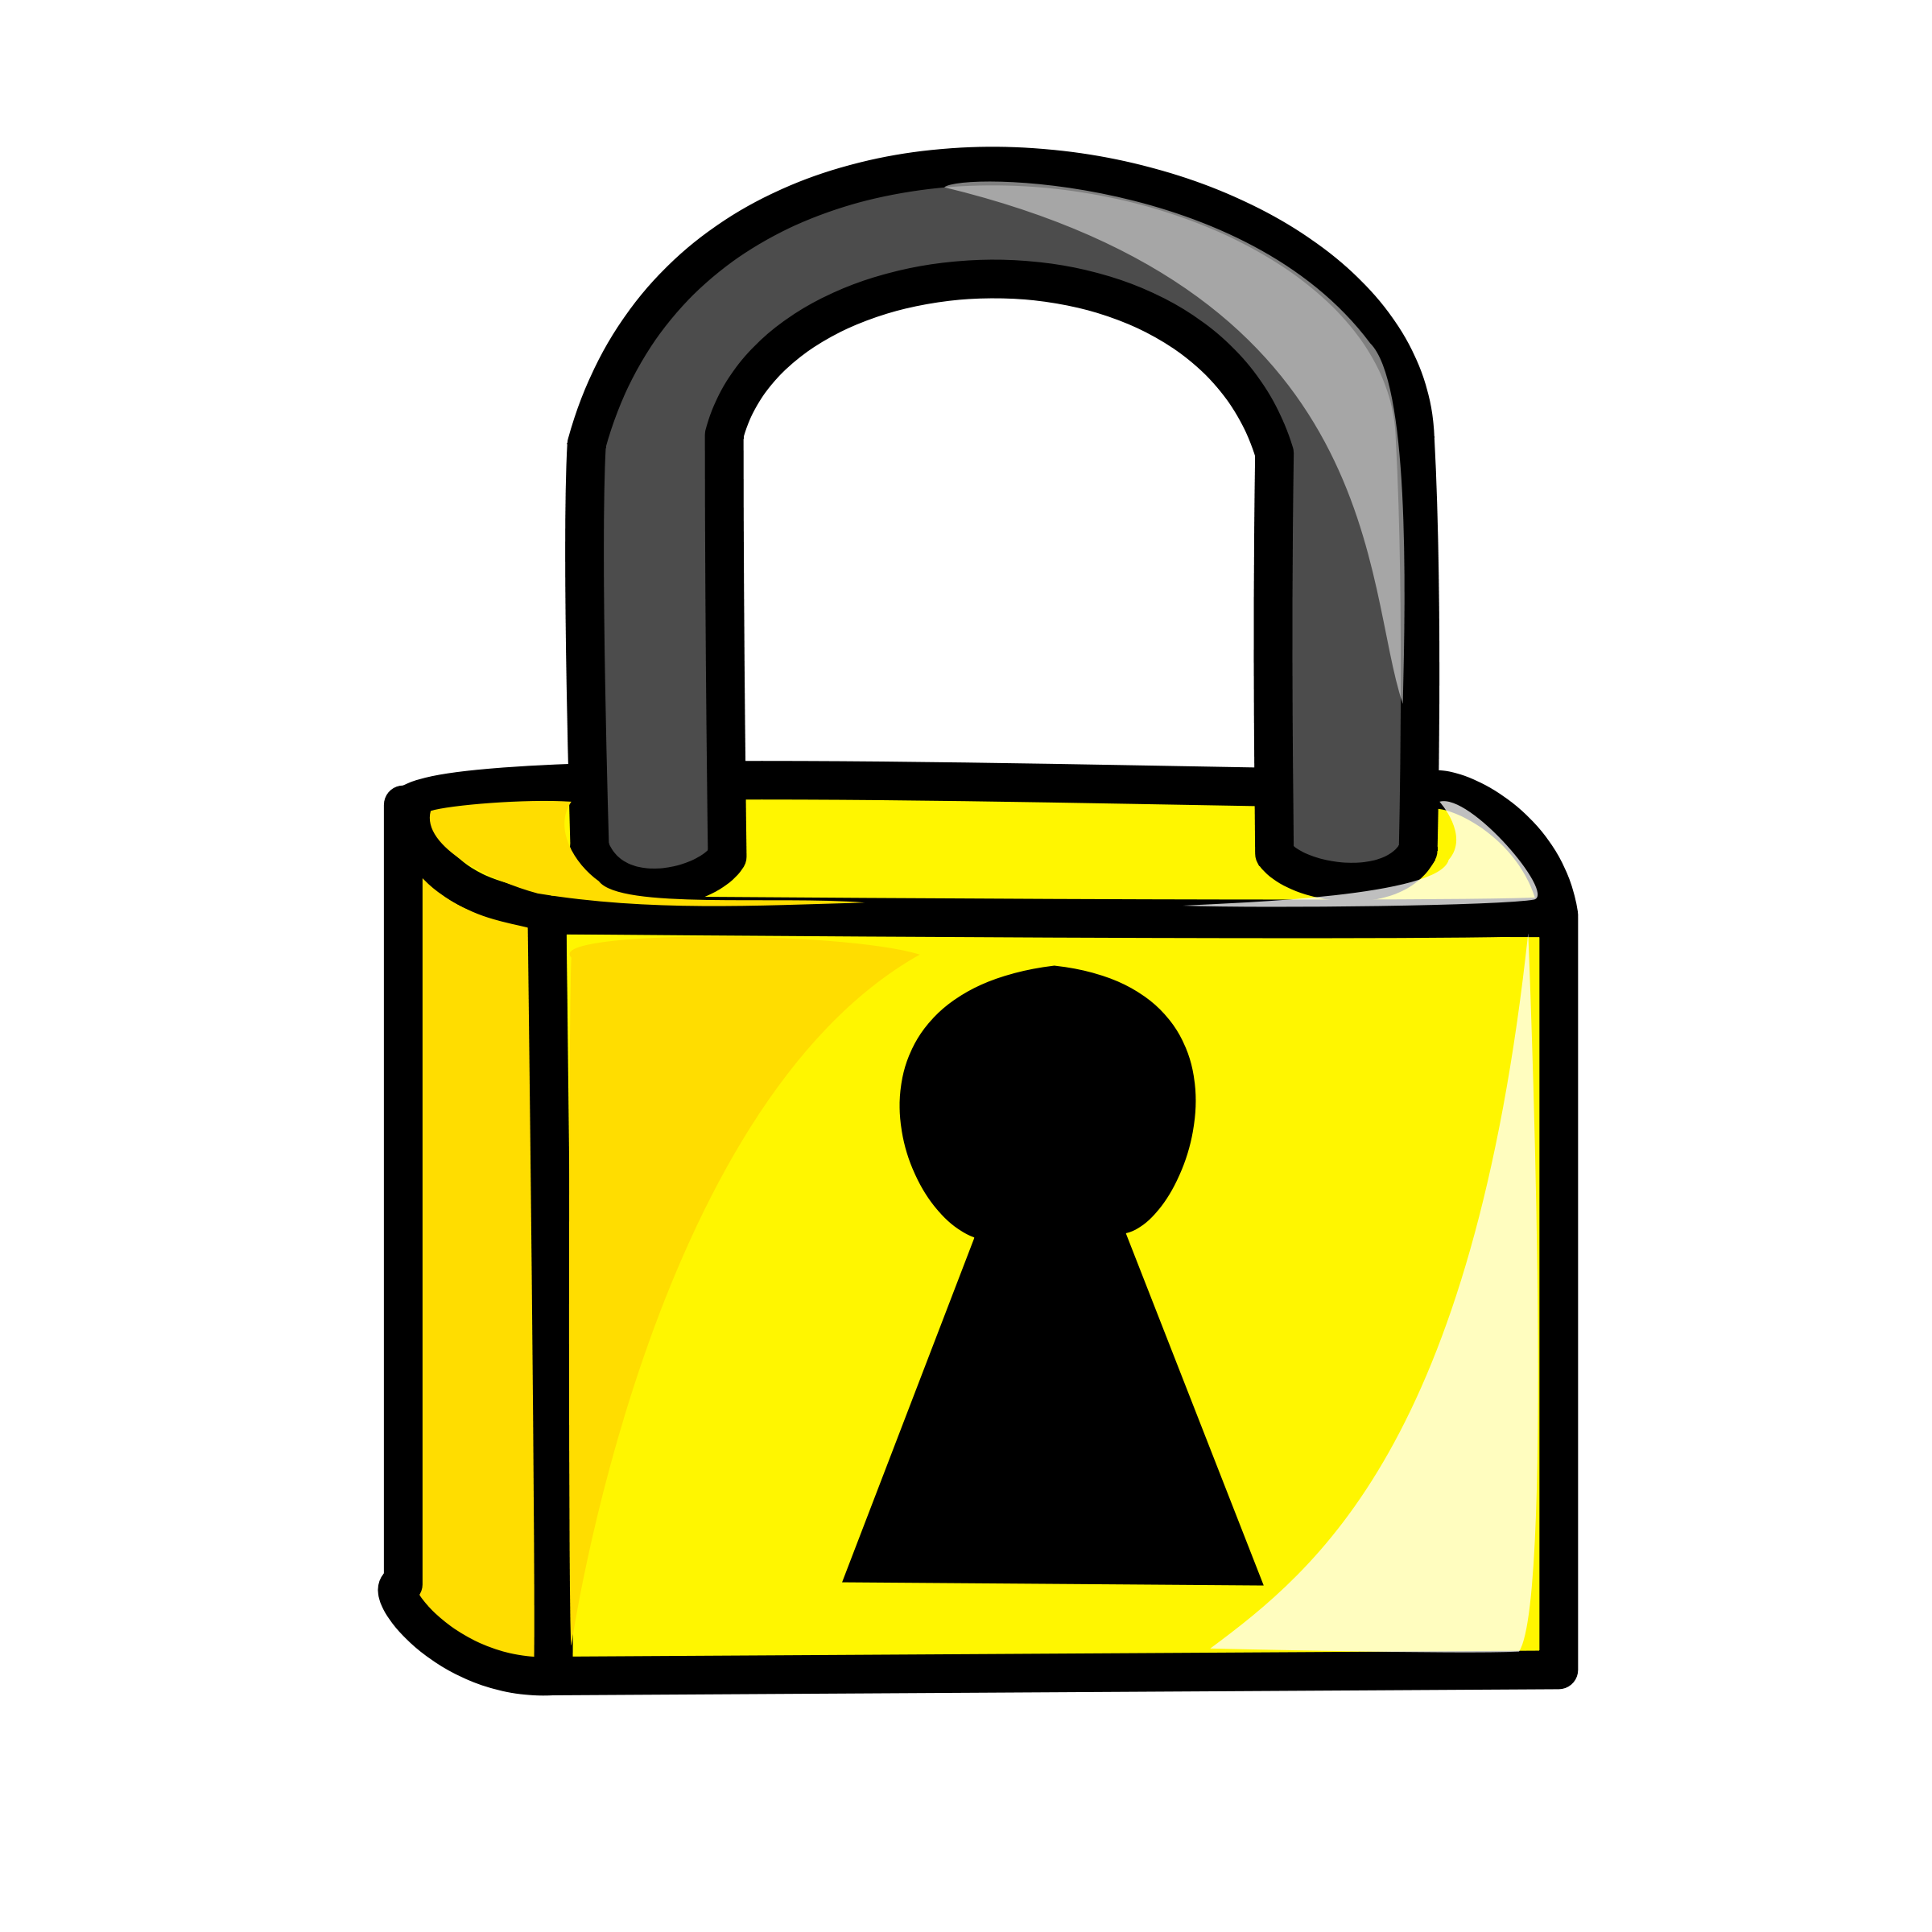 Lock clipart images svg download Lock Clip Art Free   Clipart Panda - Free Clipart Images svg download